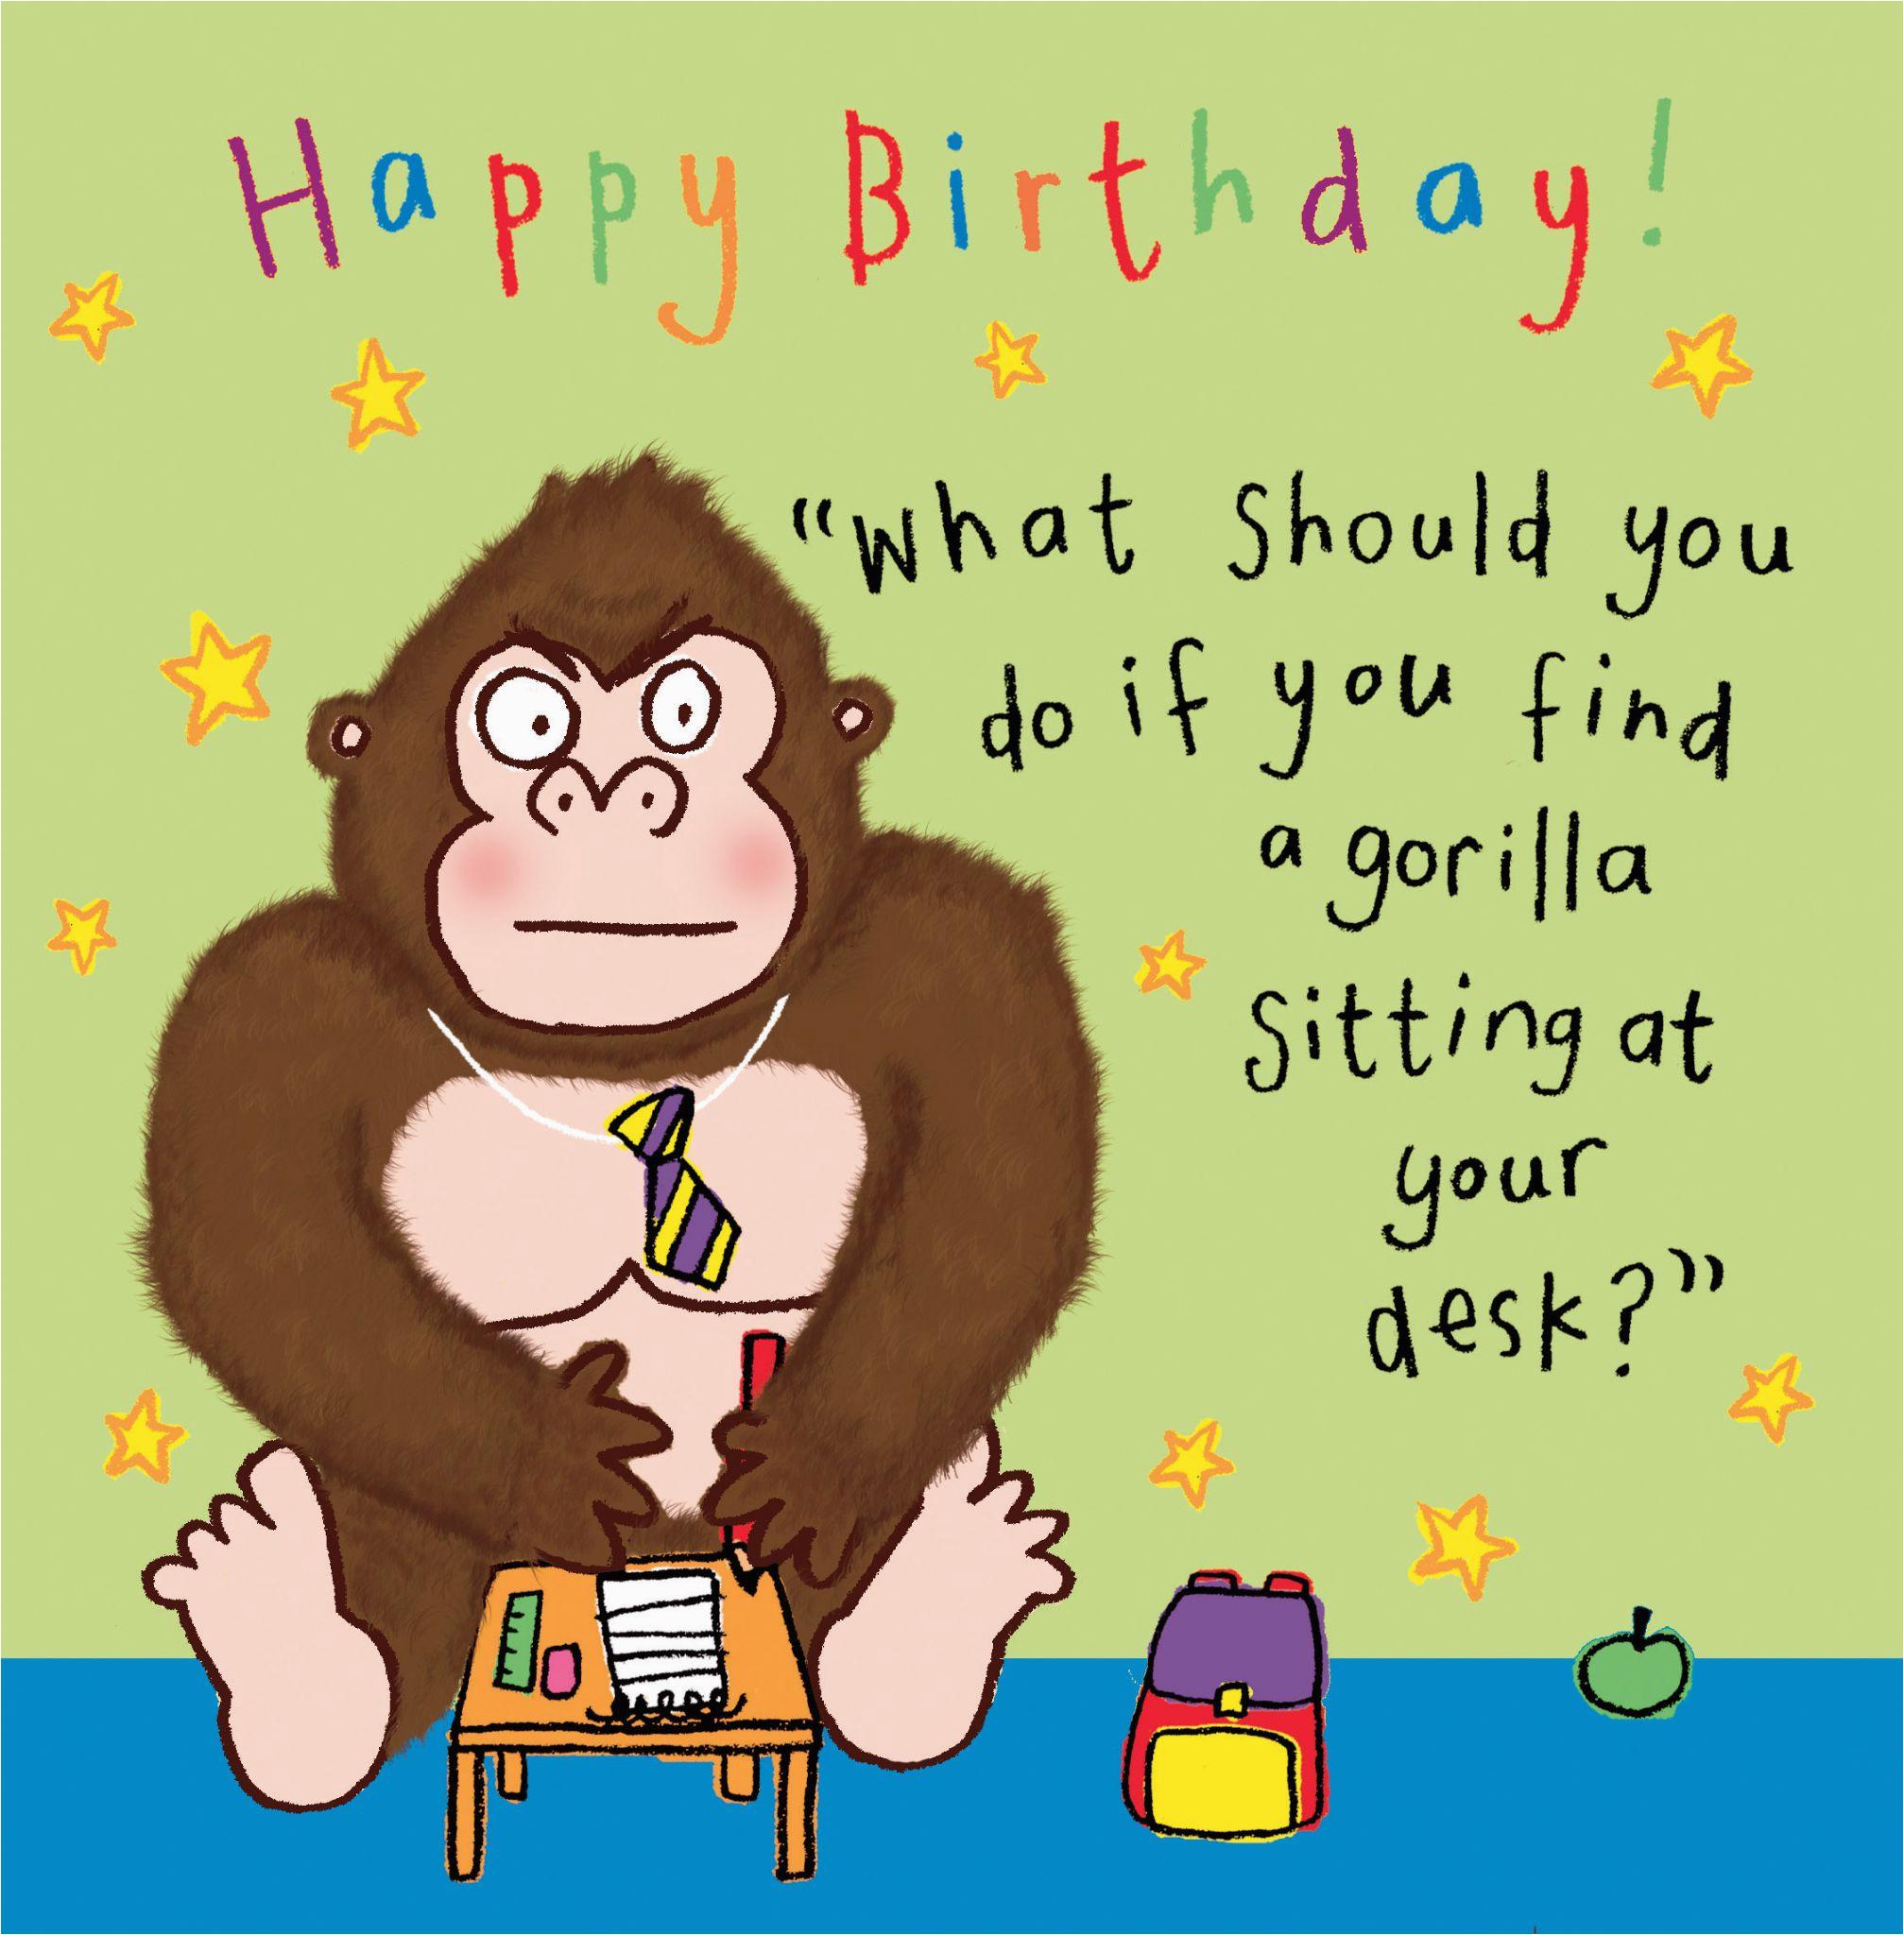 Funny Jokes for Birthday Cards Gorilla Funny Joke Birthday Card for Kids Tw434